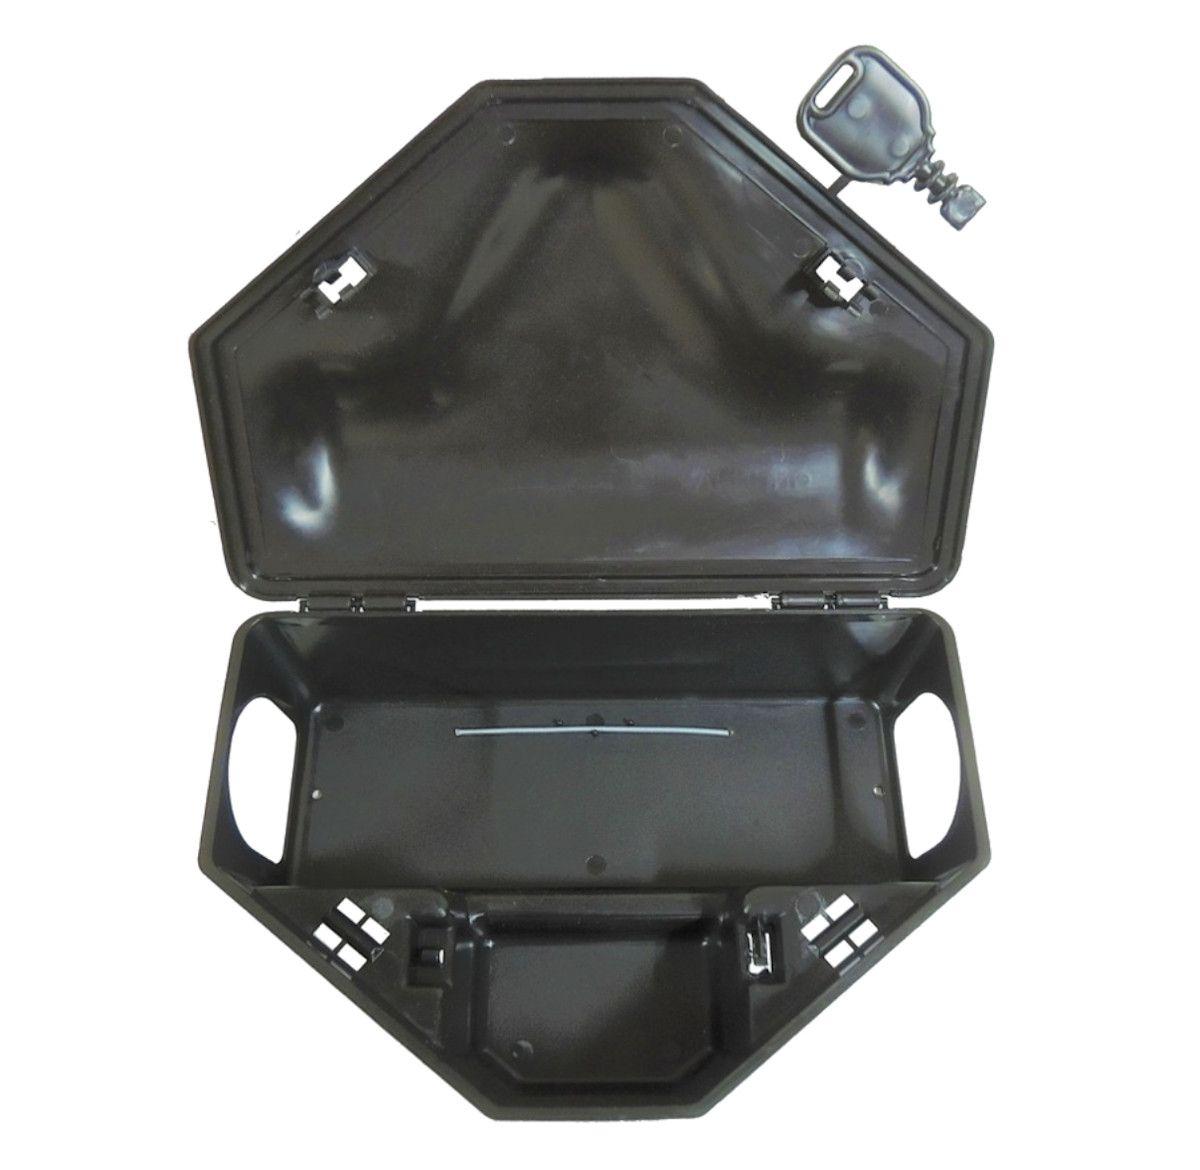 KIT 50 Porta Iscas Resistentes 2 TRAVAS c/ Chave Mata Ratos